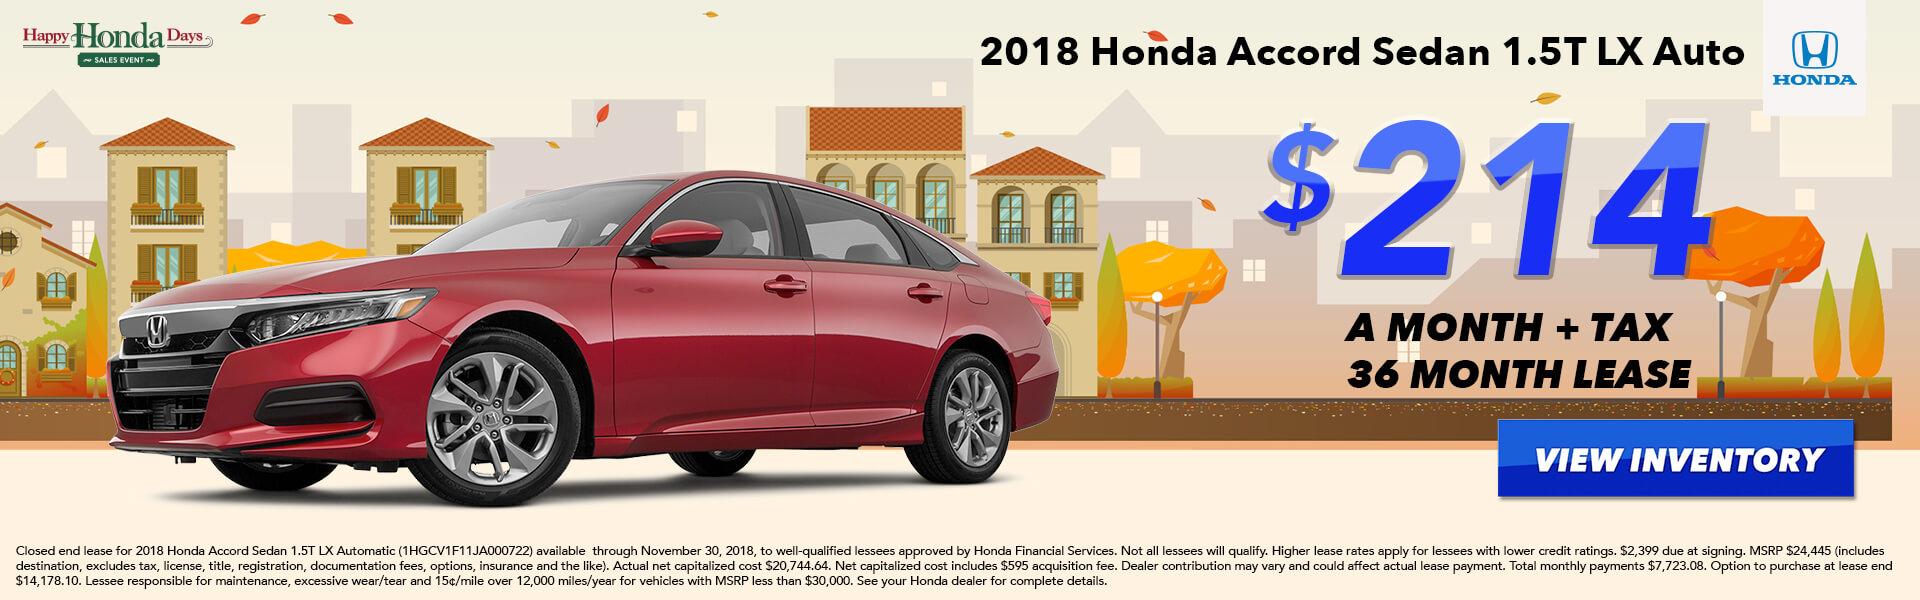 Accord Sedan Lease $214